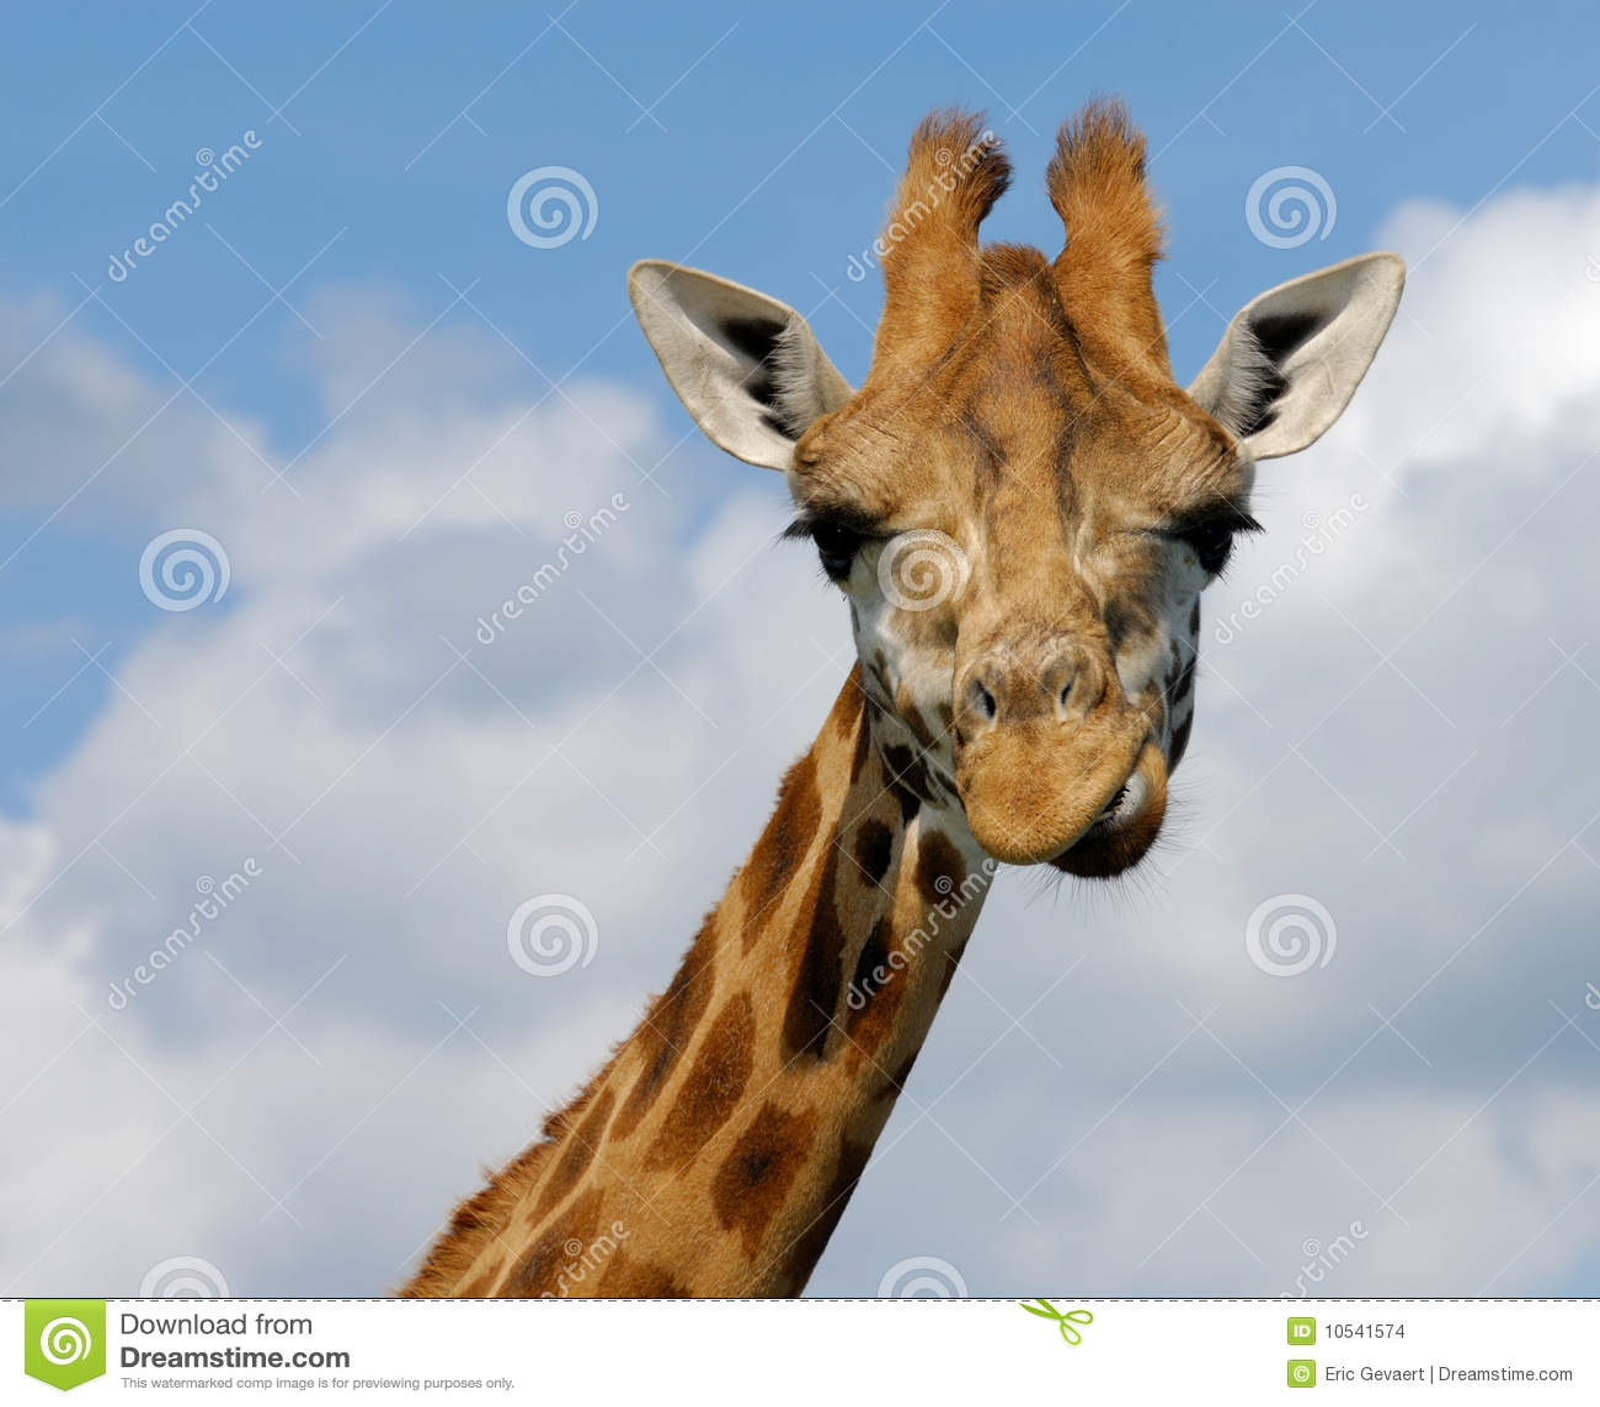 Cute giraffe stock photo. Image of long, pattern ...